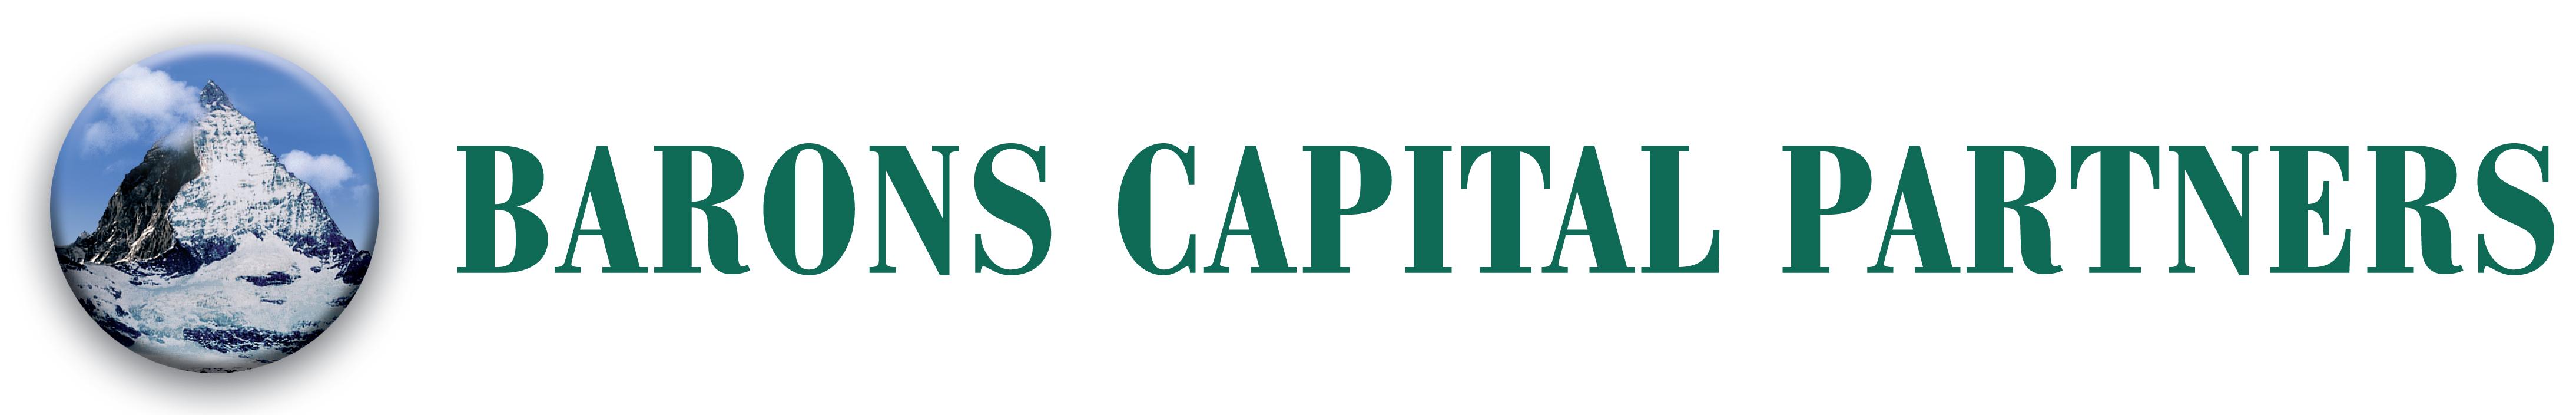 Barons Capital Partners